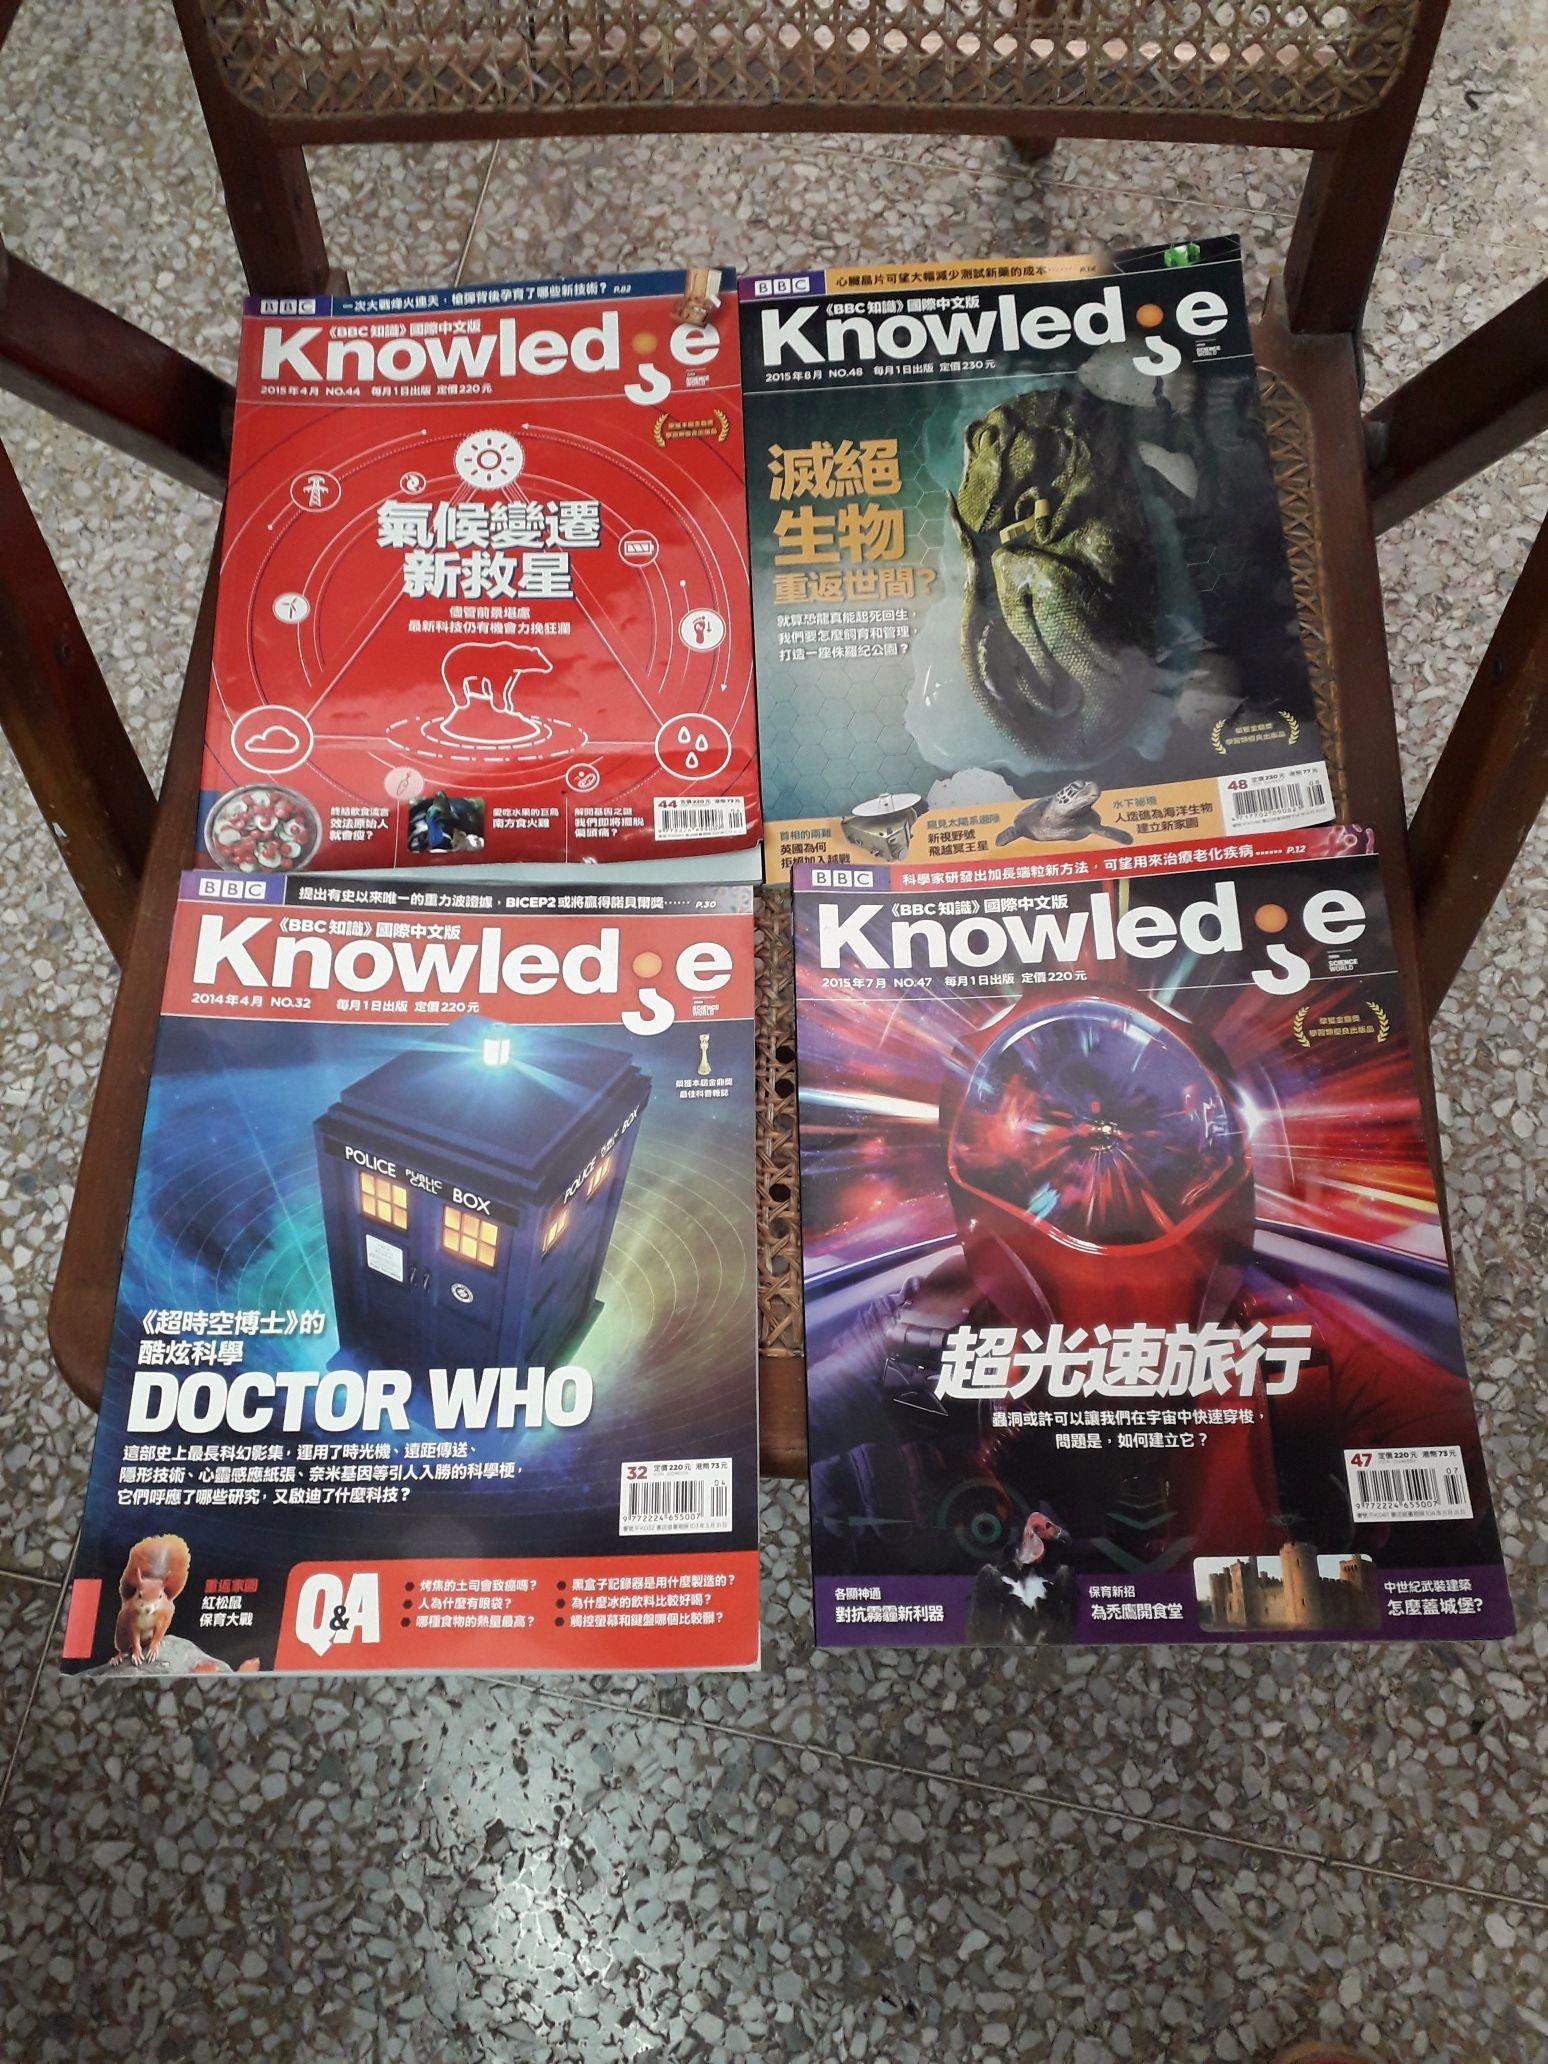 BBC知識國際中文版Knowledge, 五選一,定價為一本之售價